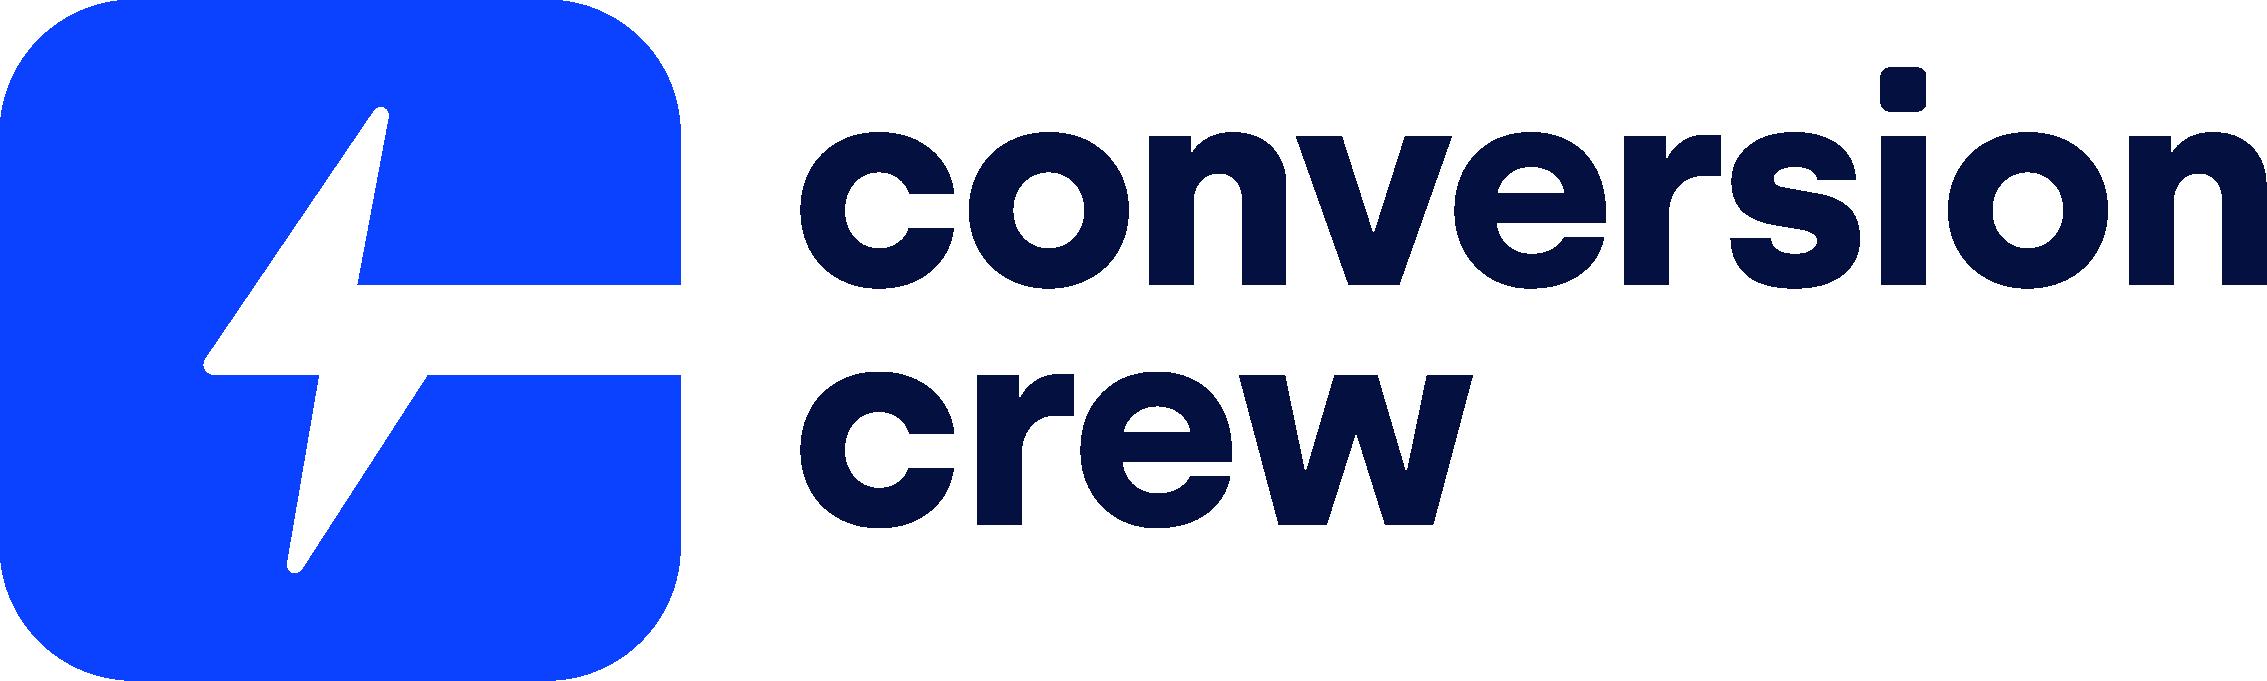 Conversion Crew